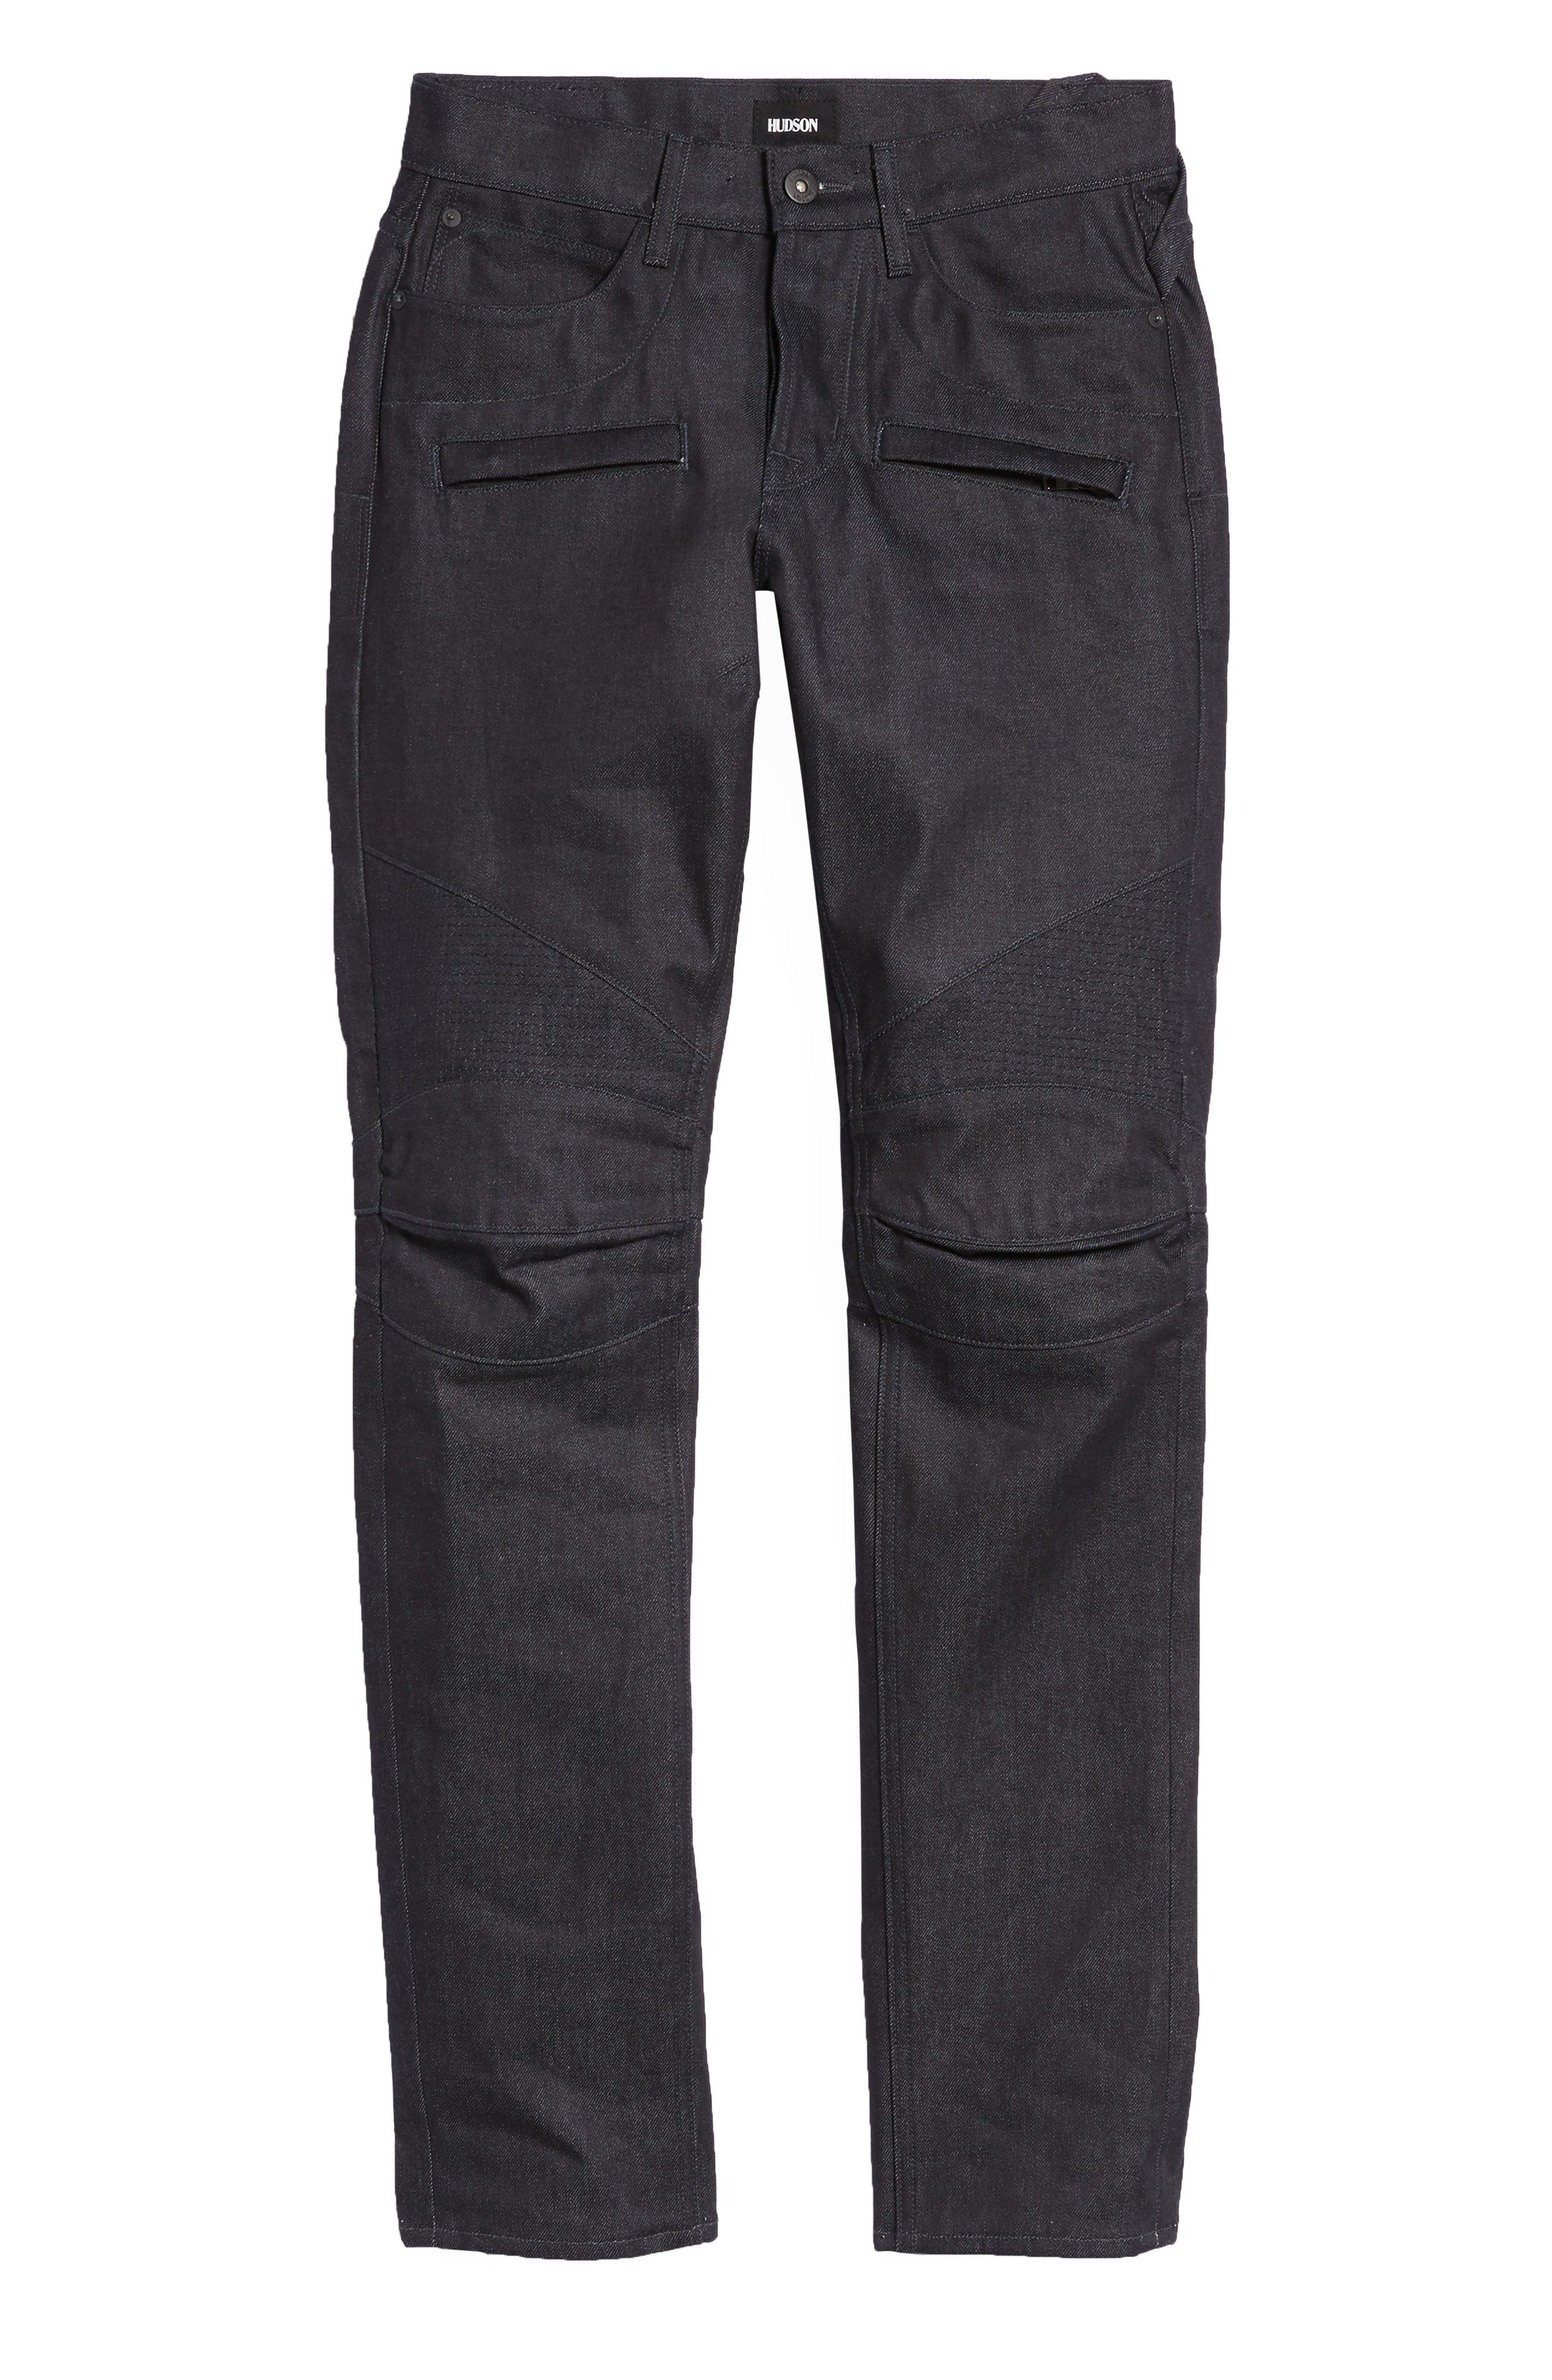 Blinder Biker Skinny Fit Jeans,                             Alternate thumbnail 6, color,                             Raw